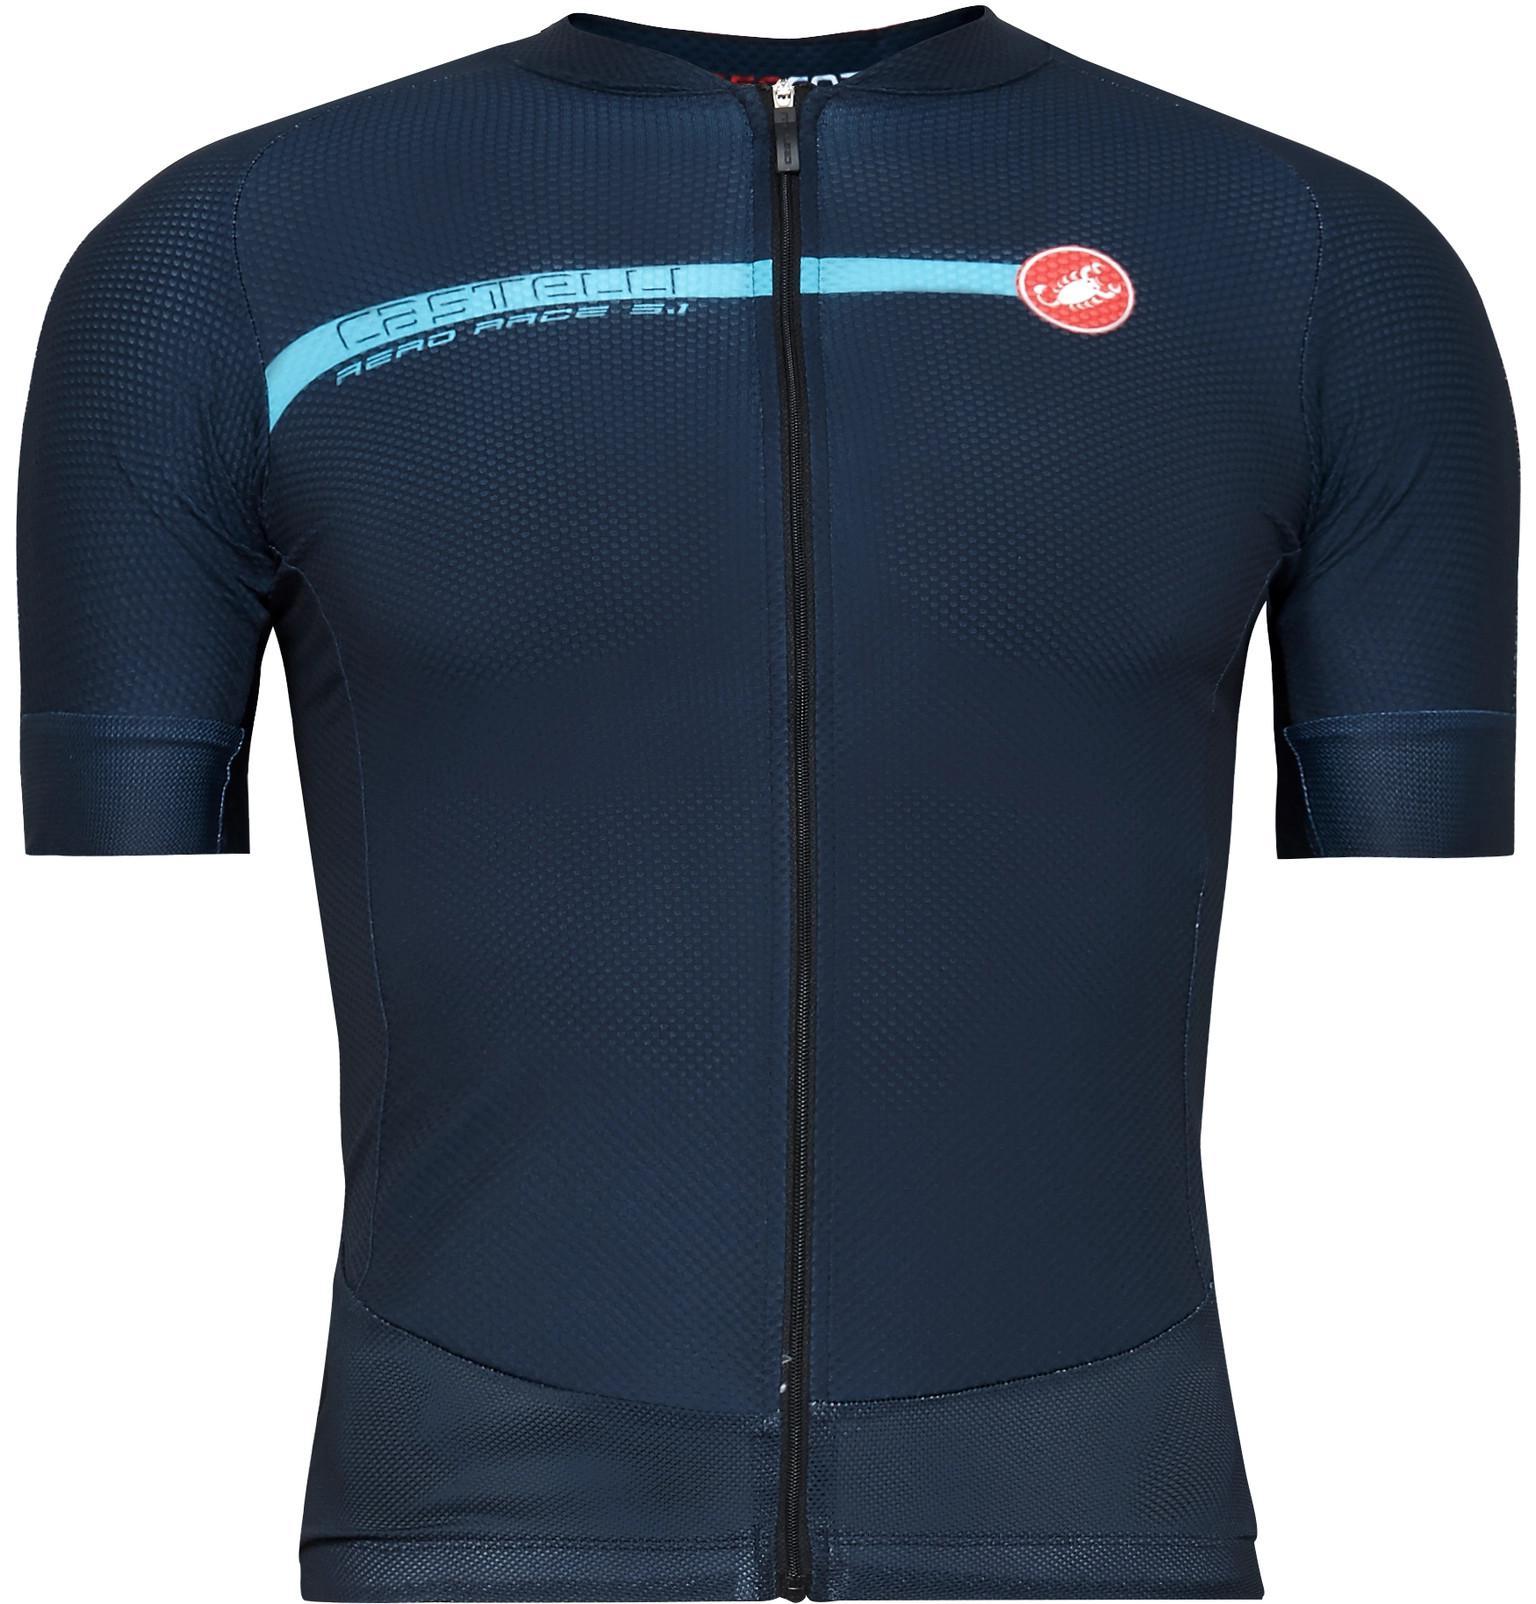 5e230c051 Lyst - Castelli Aero Race 5.1 Cycling Jersey in Blue for Men